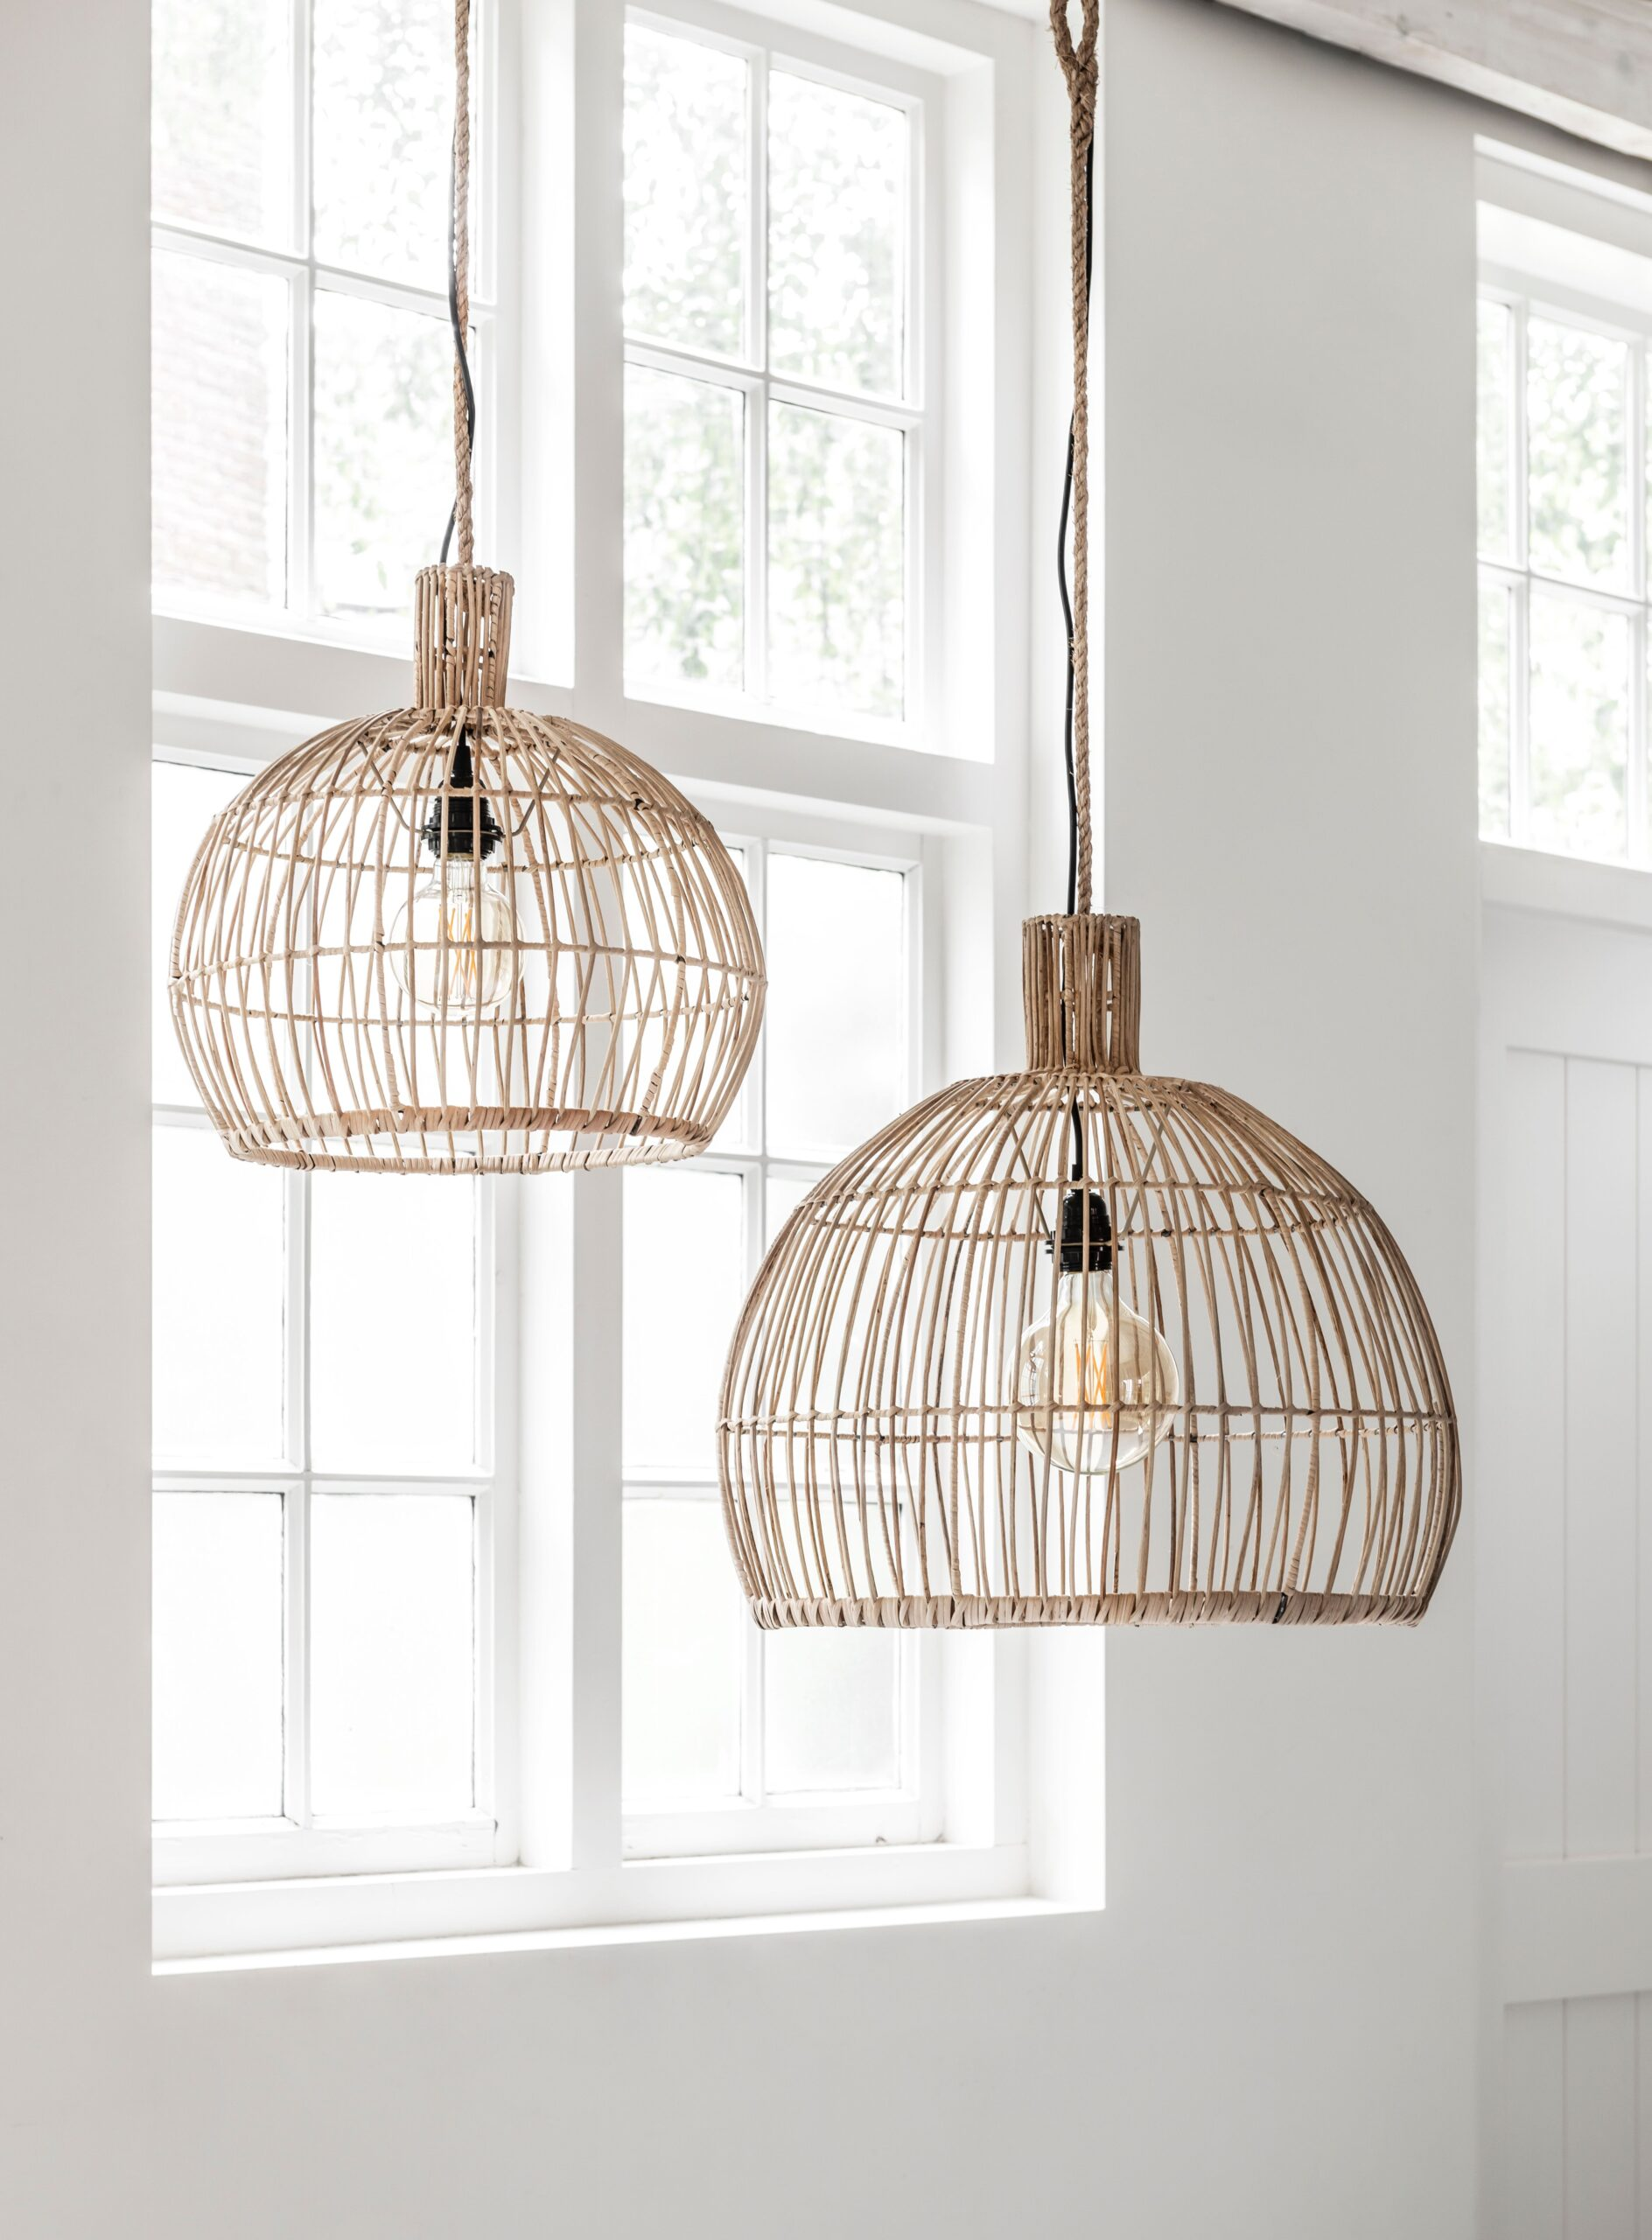 MUST LIVING hanglamp